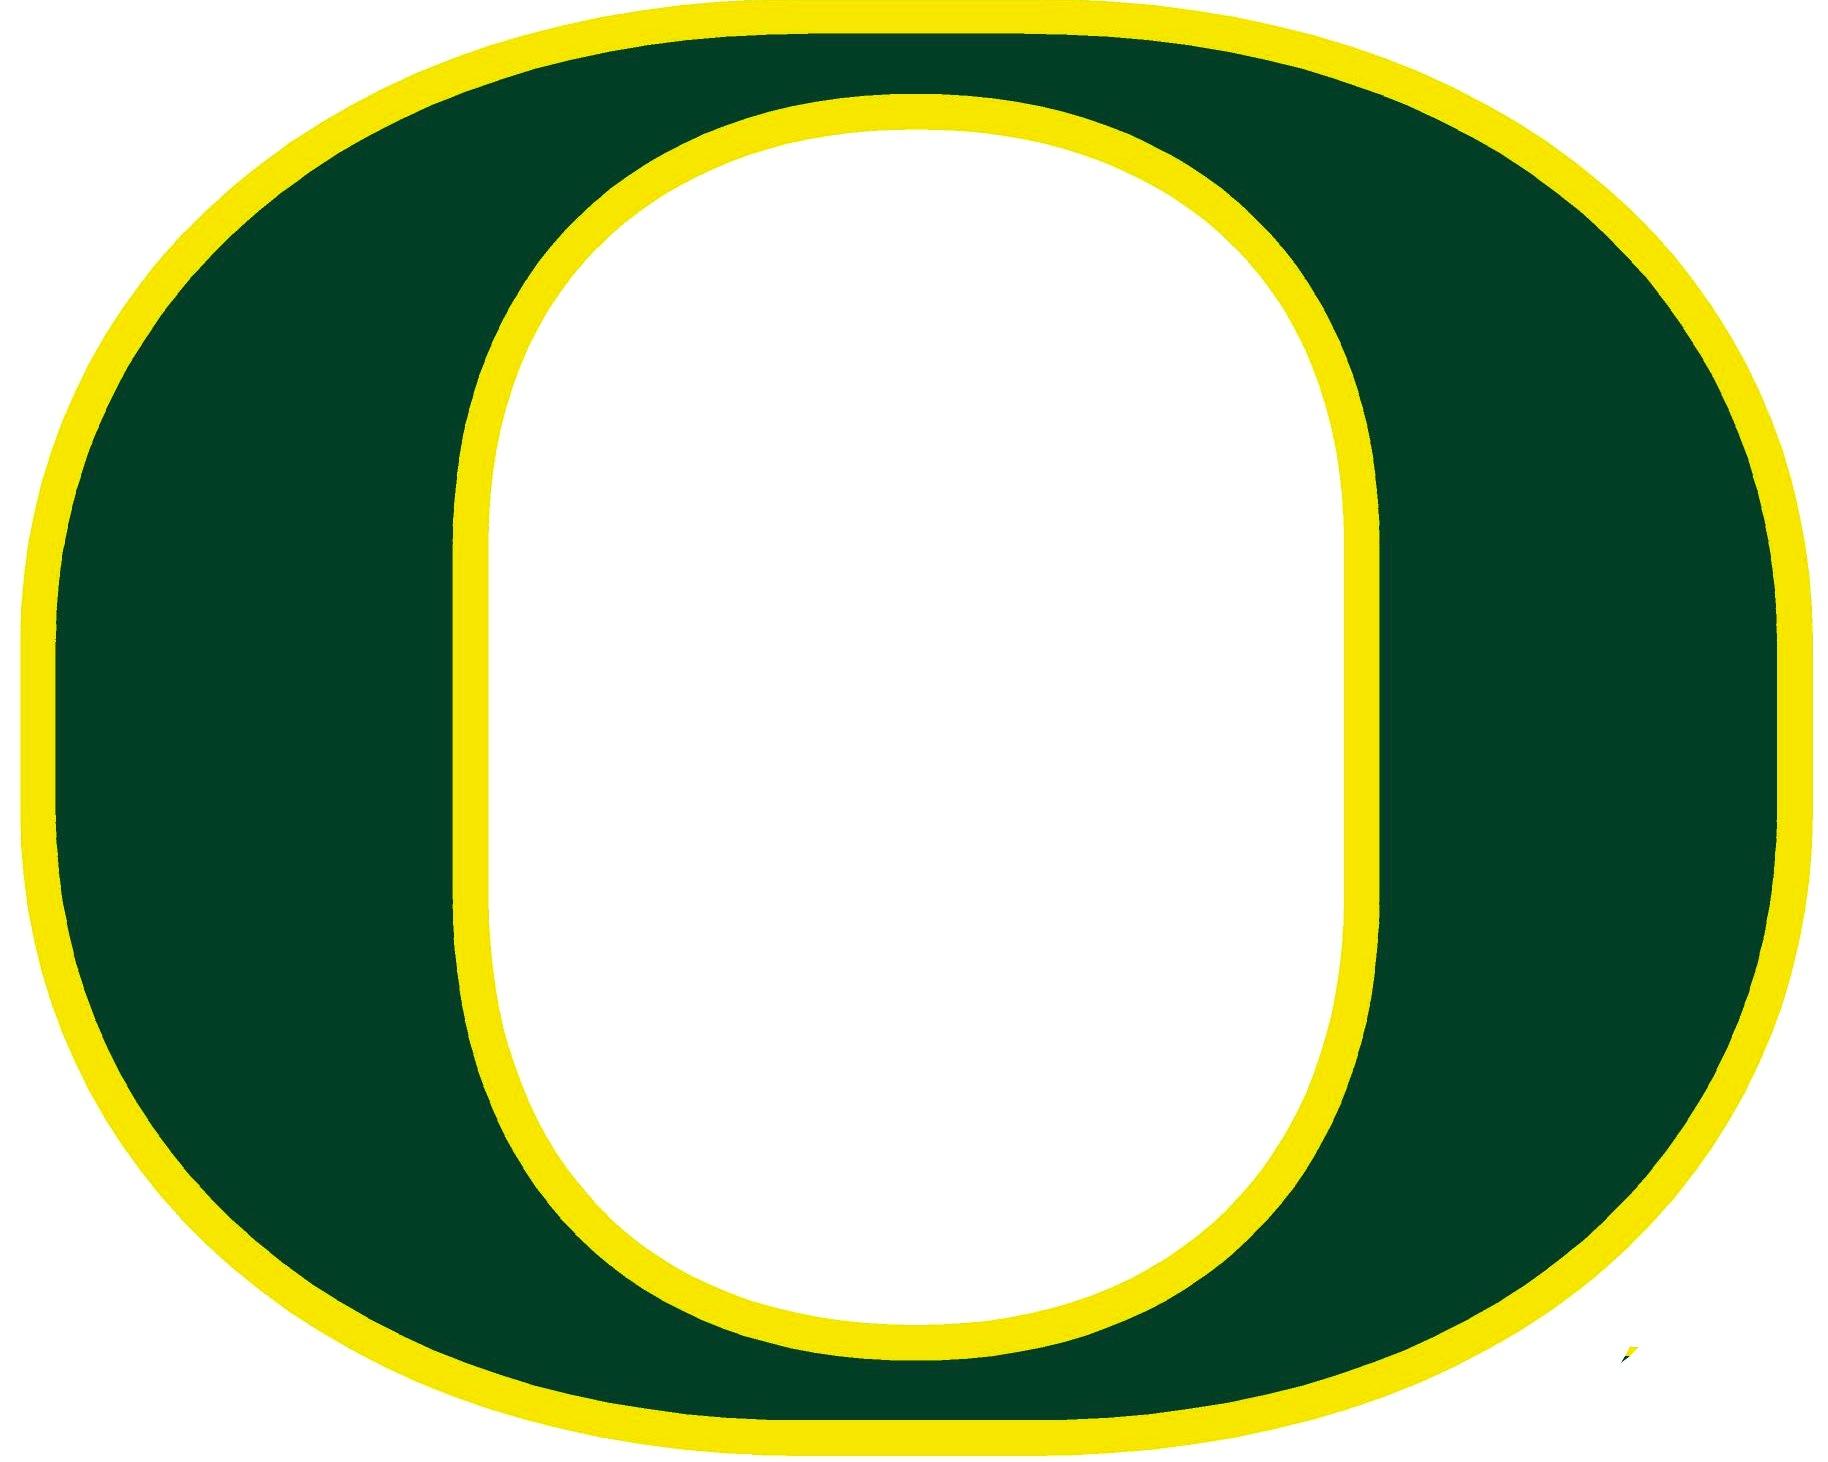 University of oregon Logos.